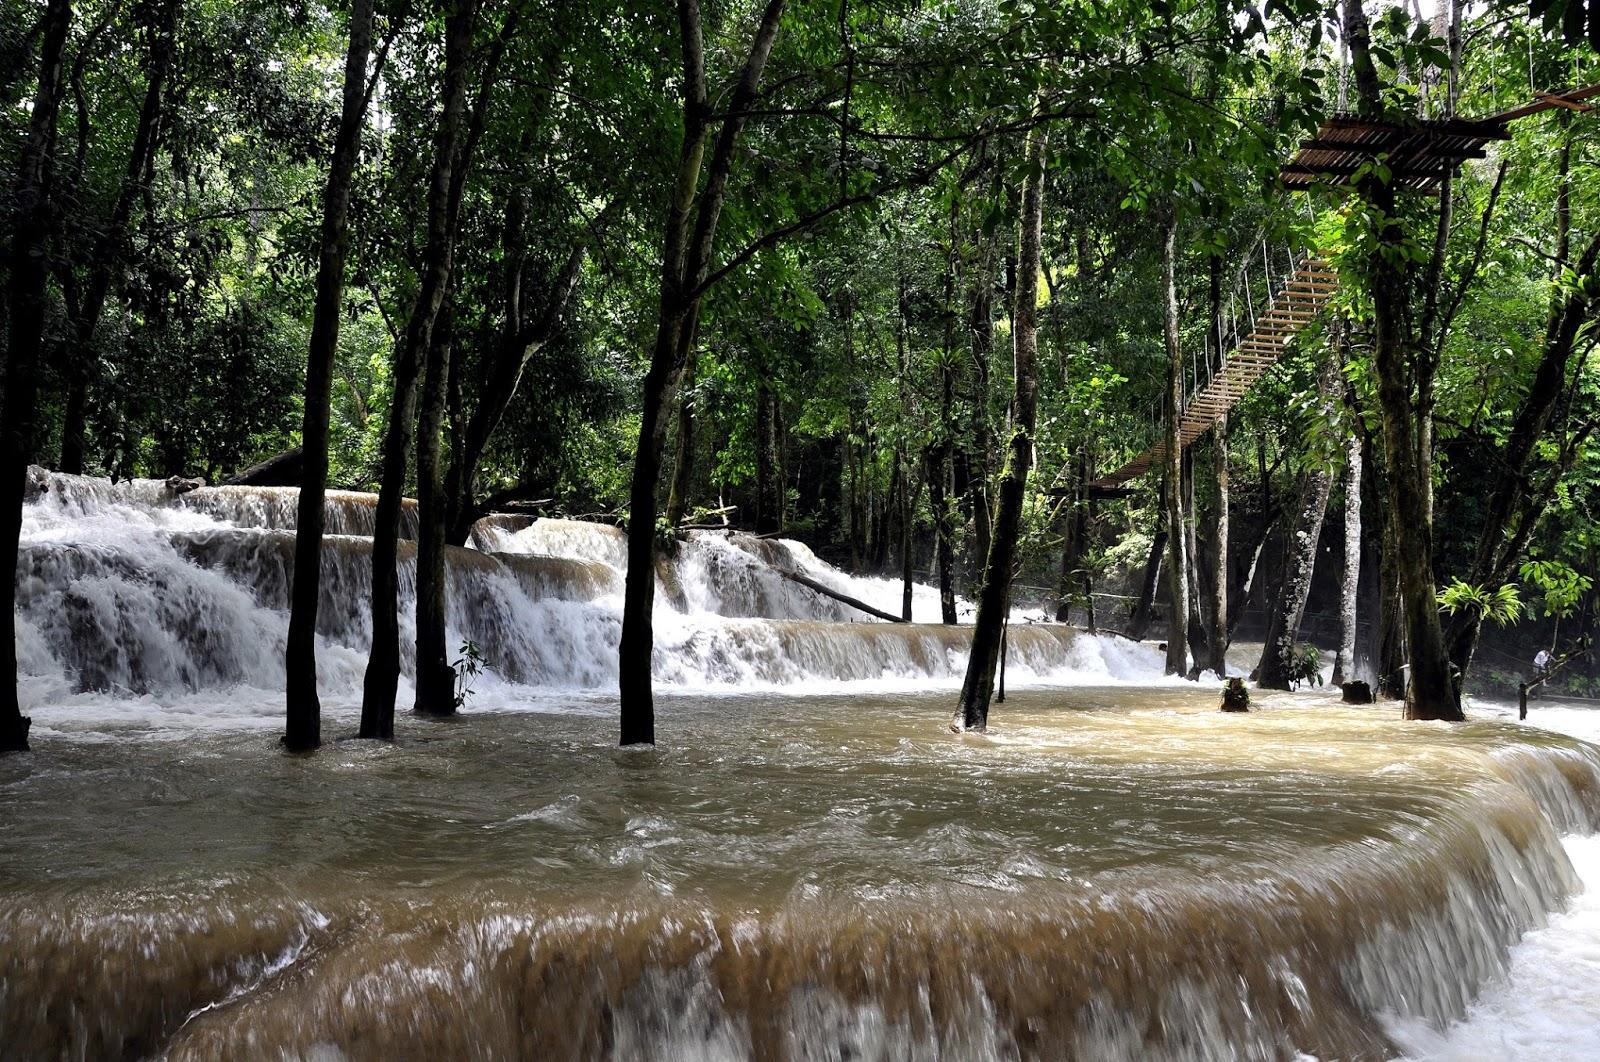 LAOS; Las cataratas Tad Sae en Luang Prabang